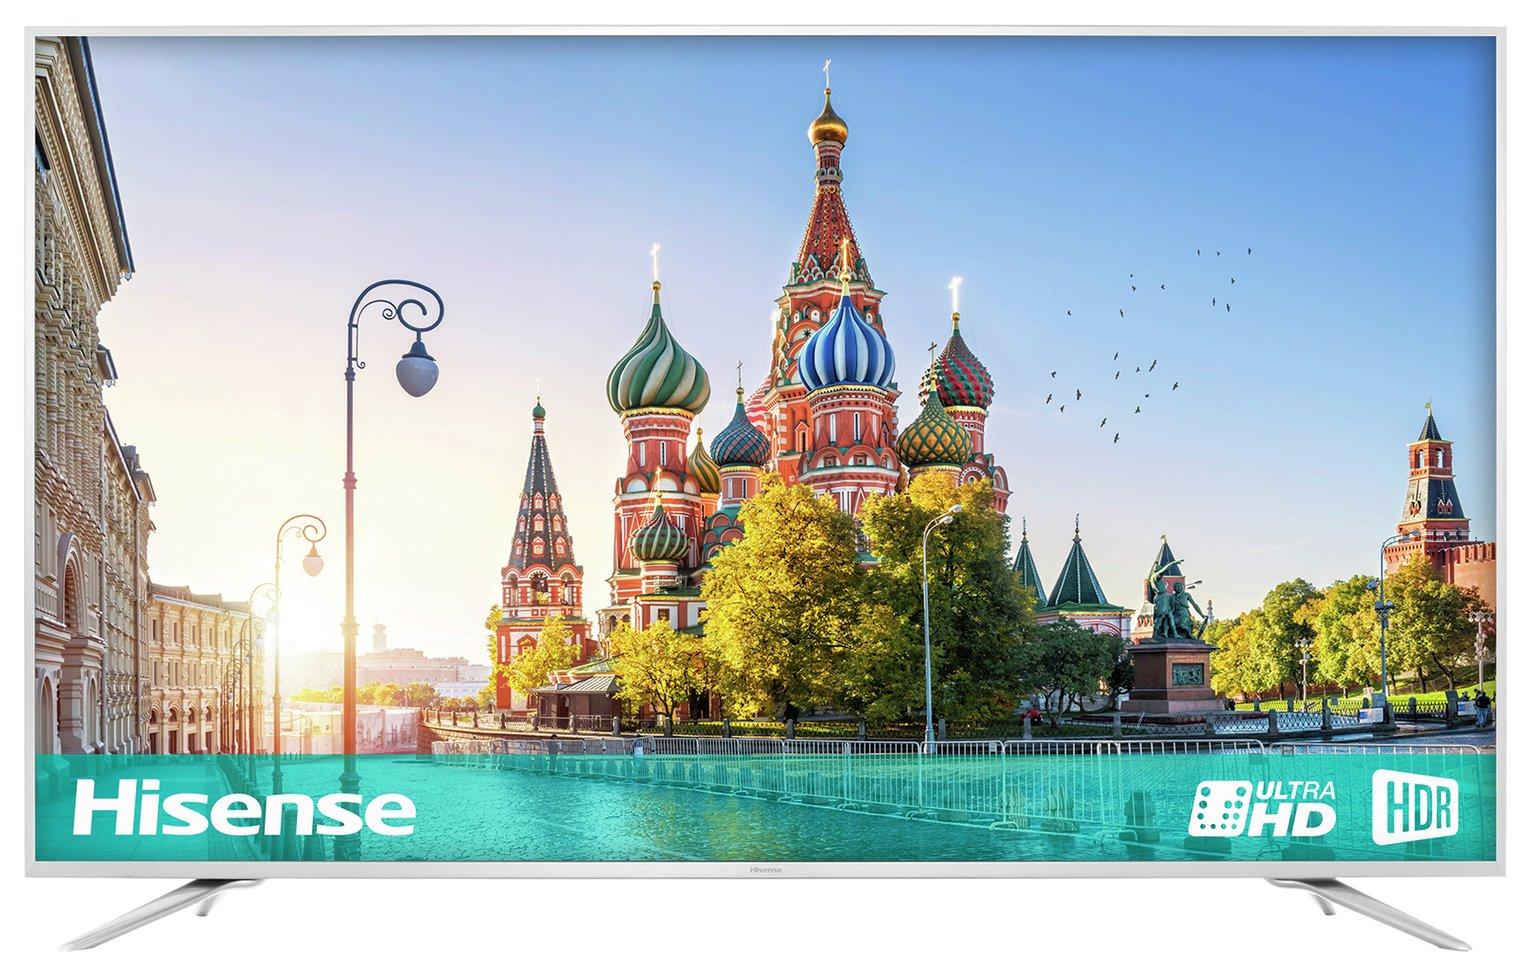 Hisense Hisense 75 Inch H75NEC6700UK Smart 4K UHD TV with HDR